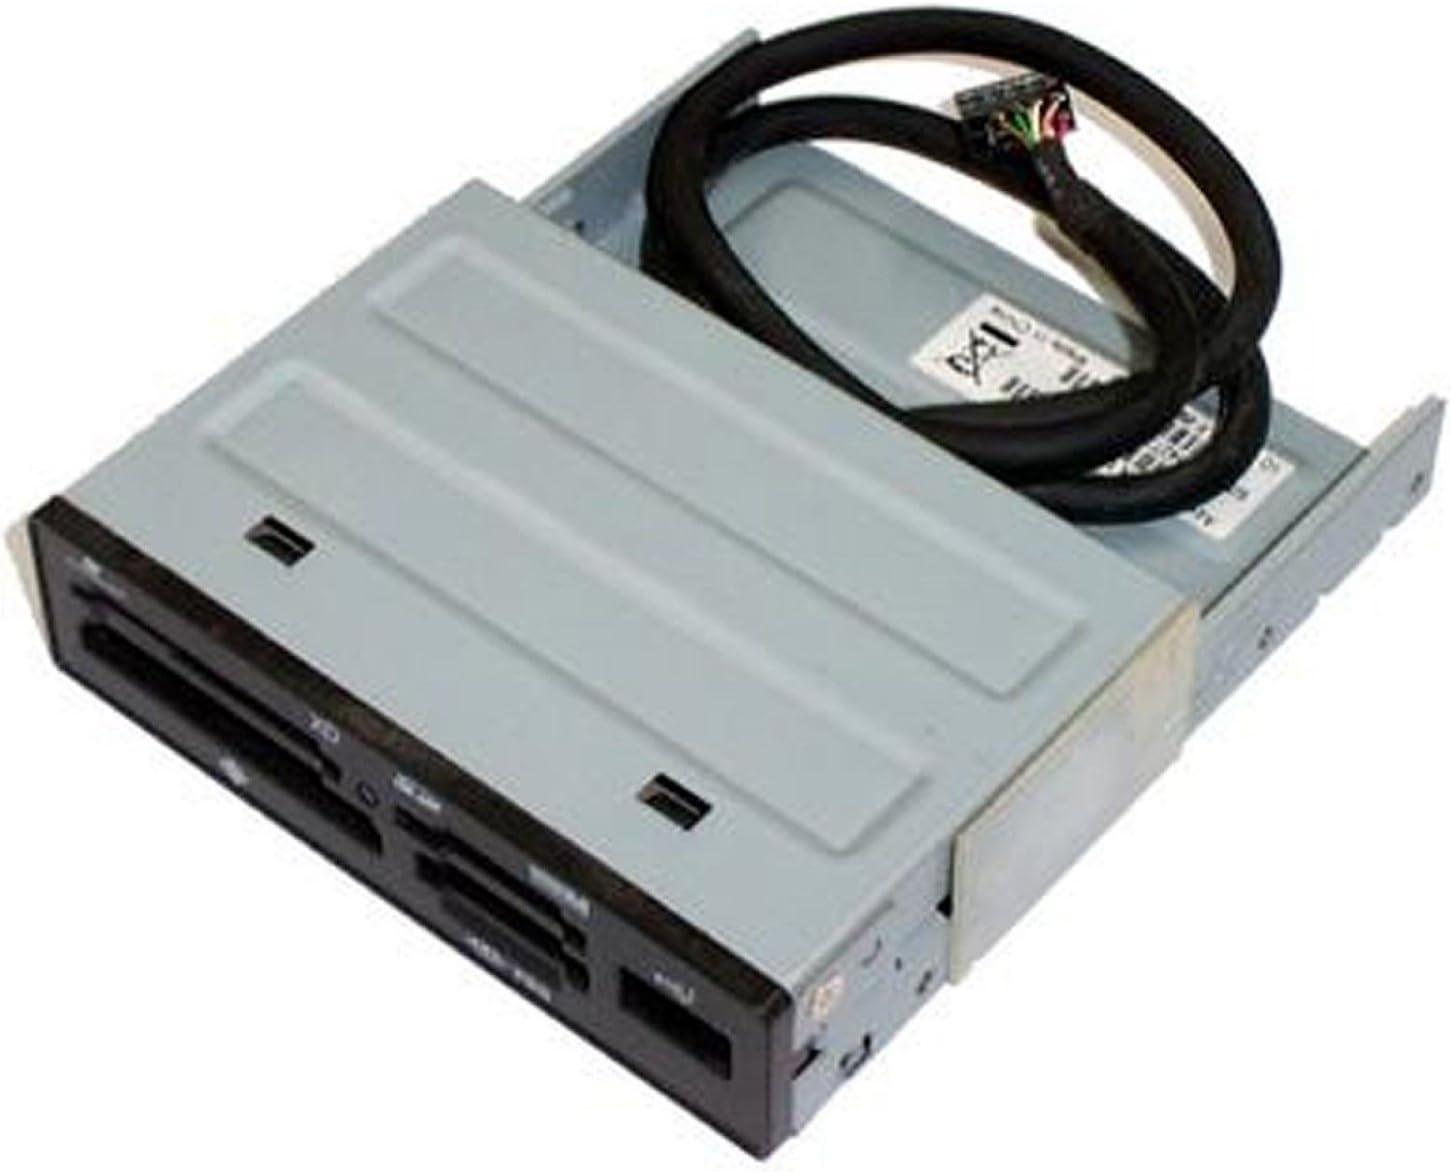 Acer Aspire M3640 M3641 M3710 M5200 - Lector de Tarjetas Original Media Card Reader CR.10400.008